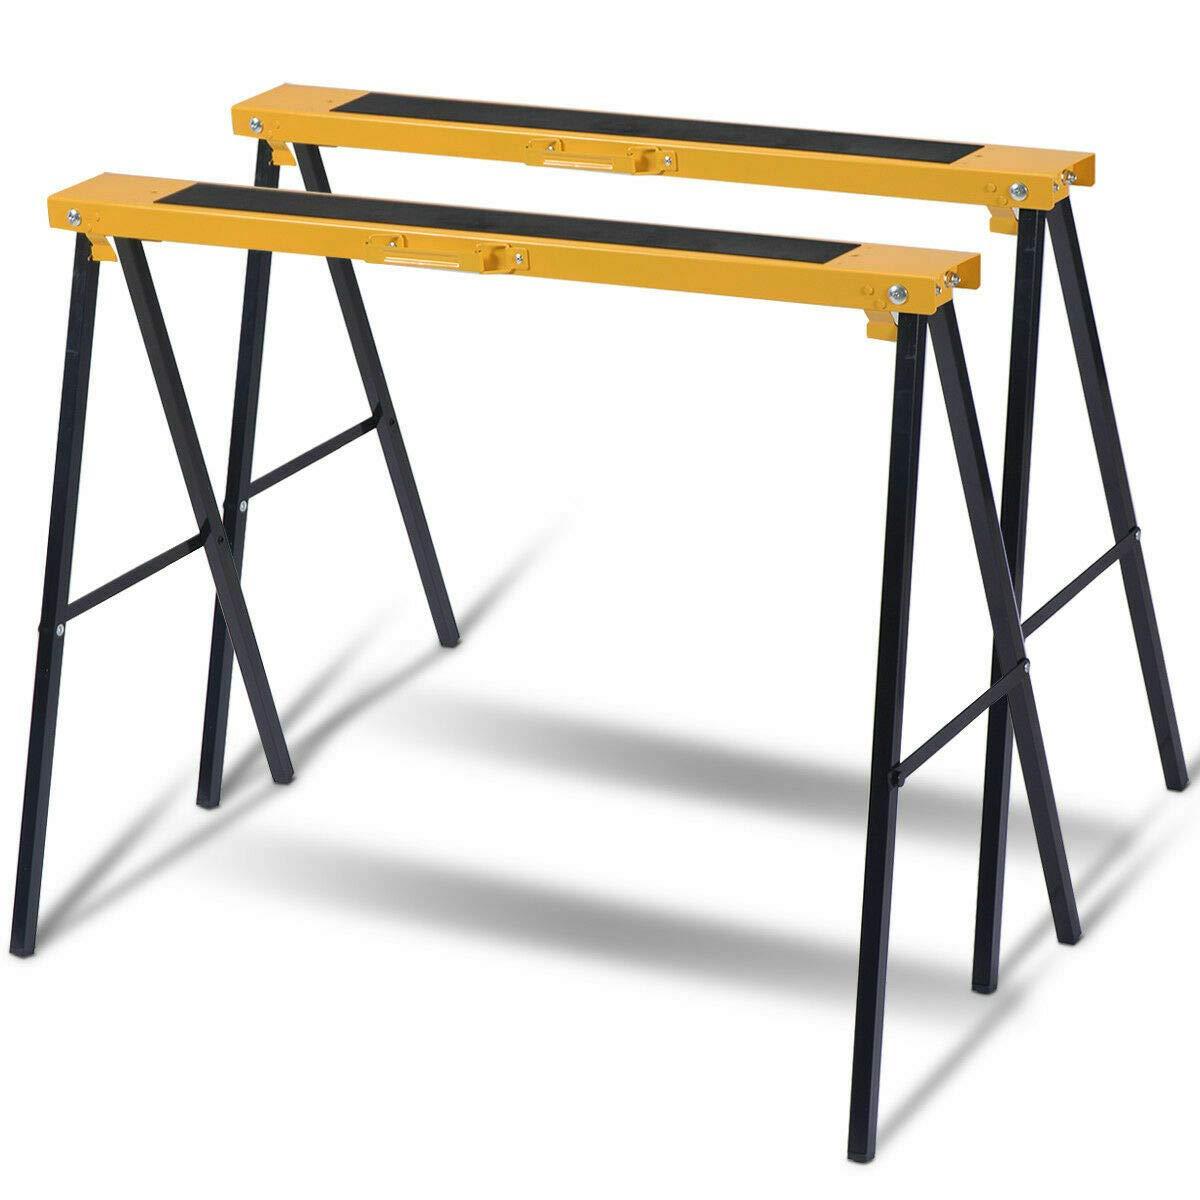 Folding legs, Pack Heavy Duty Saw Horse Steel Folding Legs Sawhorse Capacity Each by Antik shop